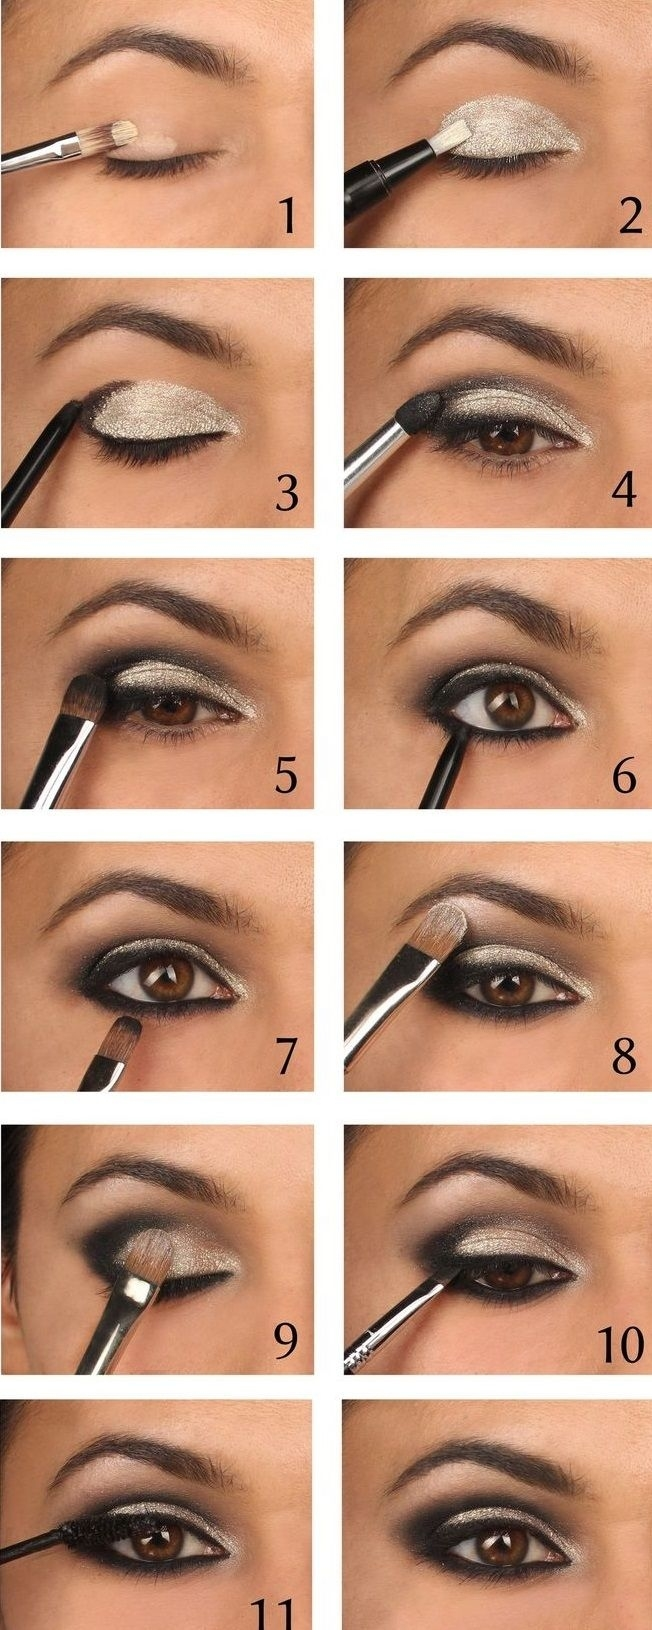 40 Hottest Smokey Eye Makeup Ideas 2020 & Smokey Eye in Smokey Eye Makeup Instructions